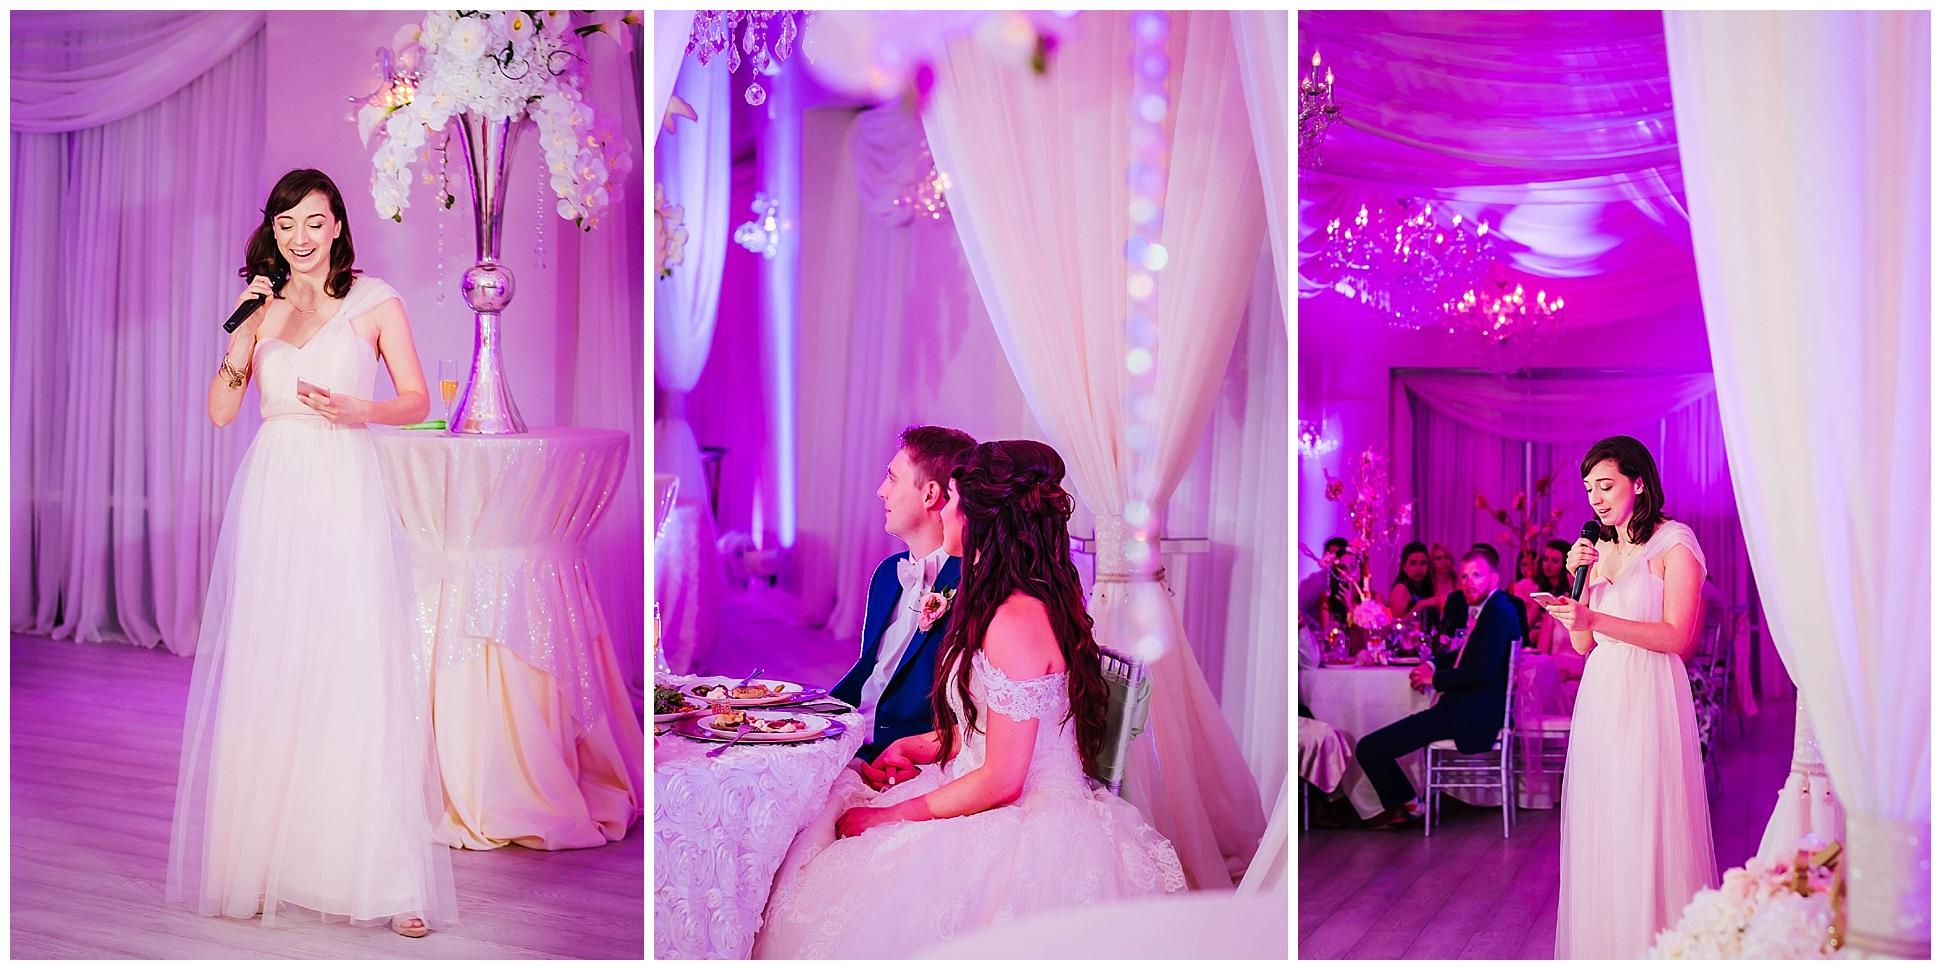 st-pete-wedding-photographer-sunken-gardens-crystal-ballroom-princess-dancer_0193.jpg